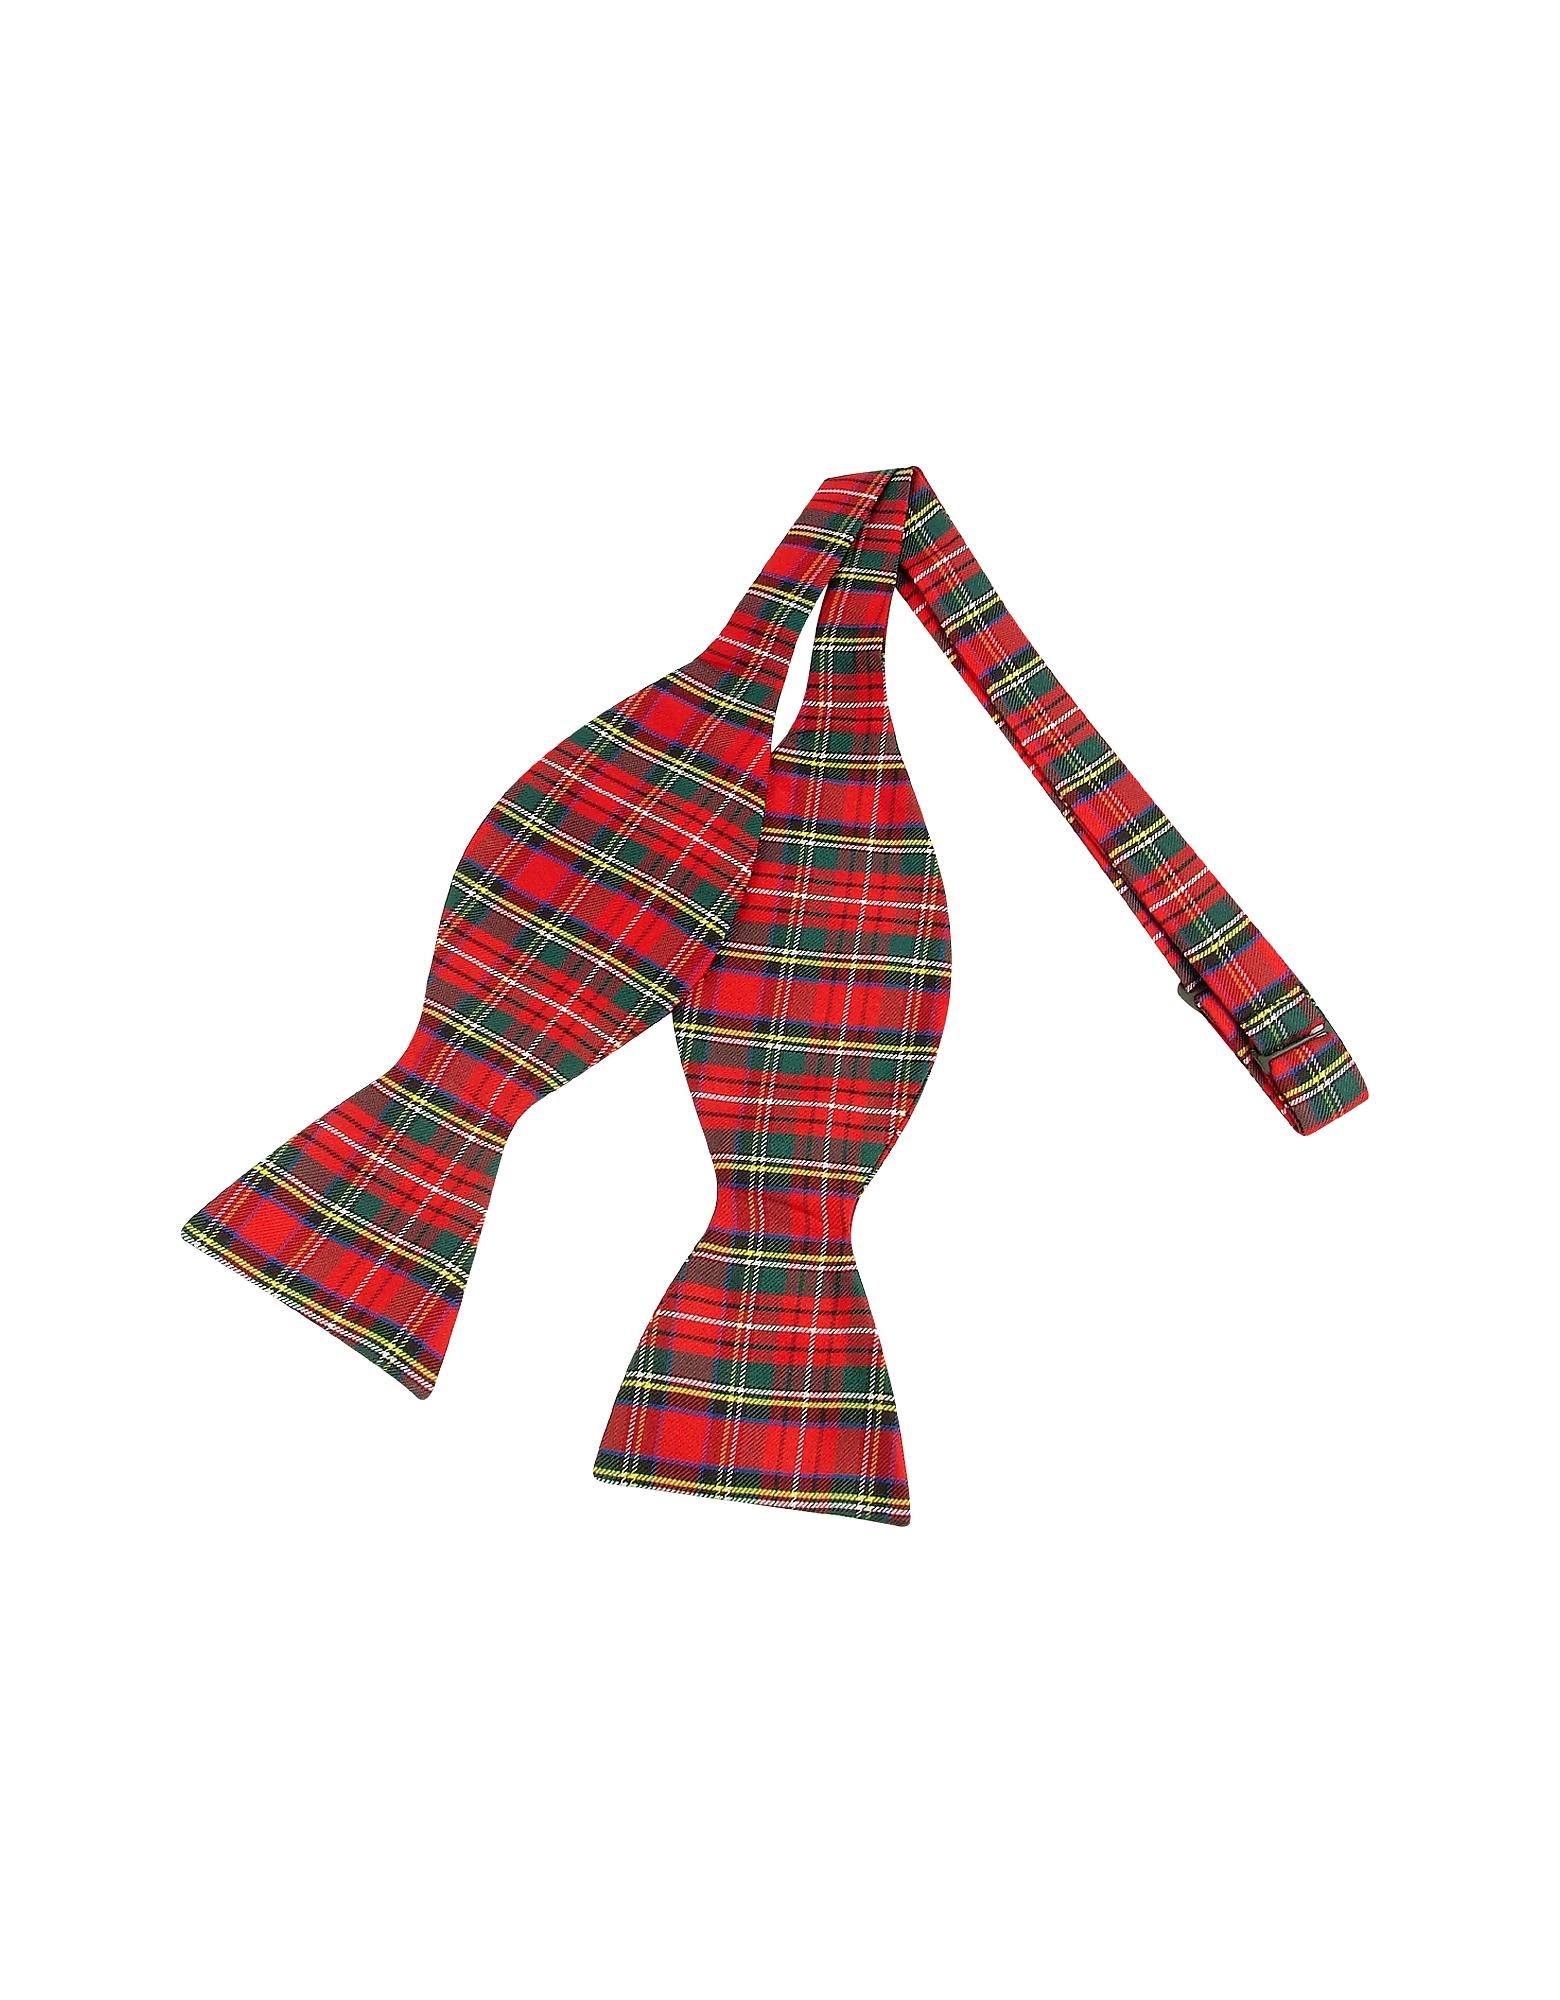 Forzieri Bowties and Cummerbunds, Red & Green Plaid Printed Silk Self-tie Bowtie